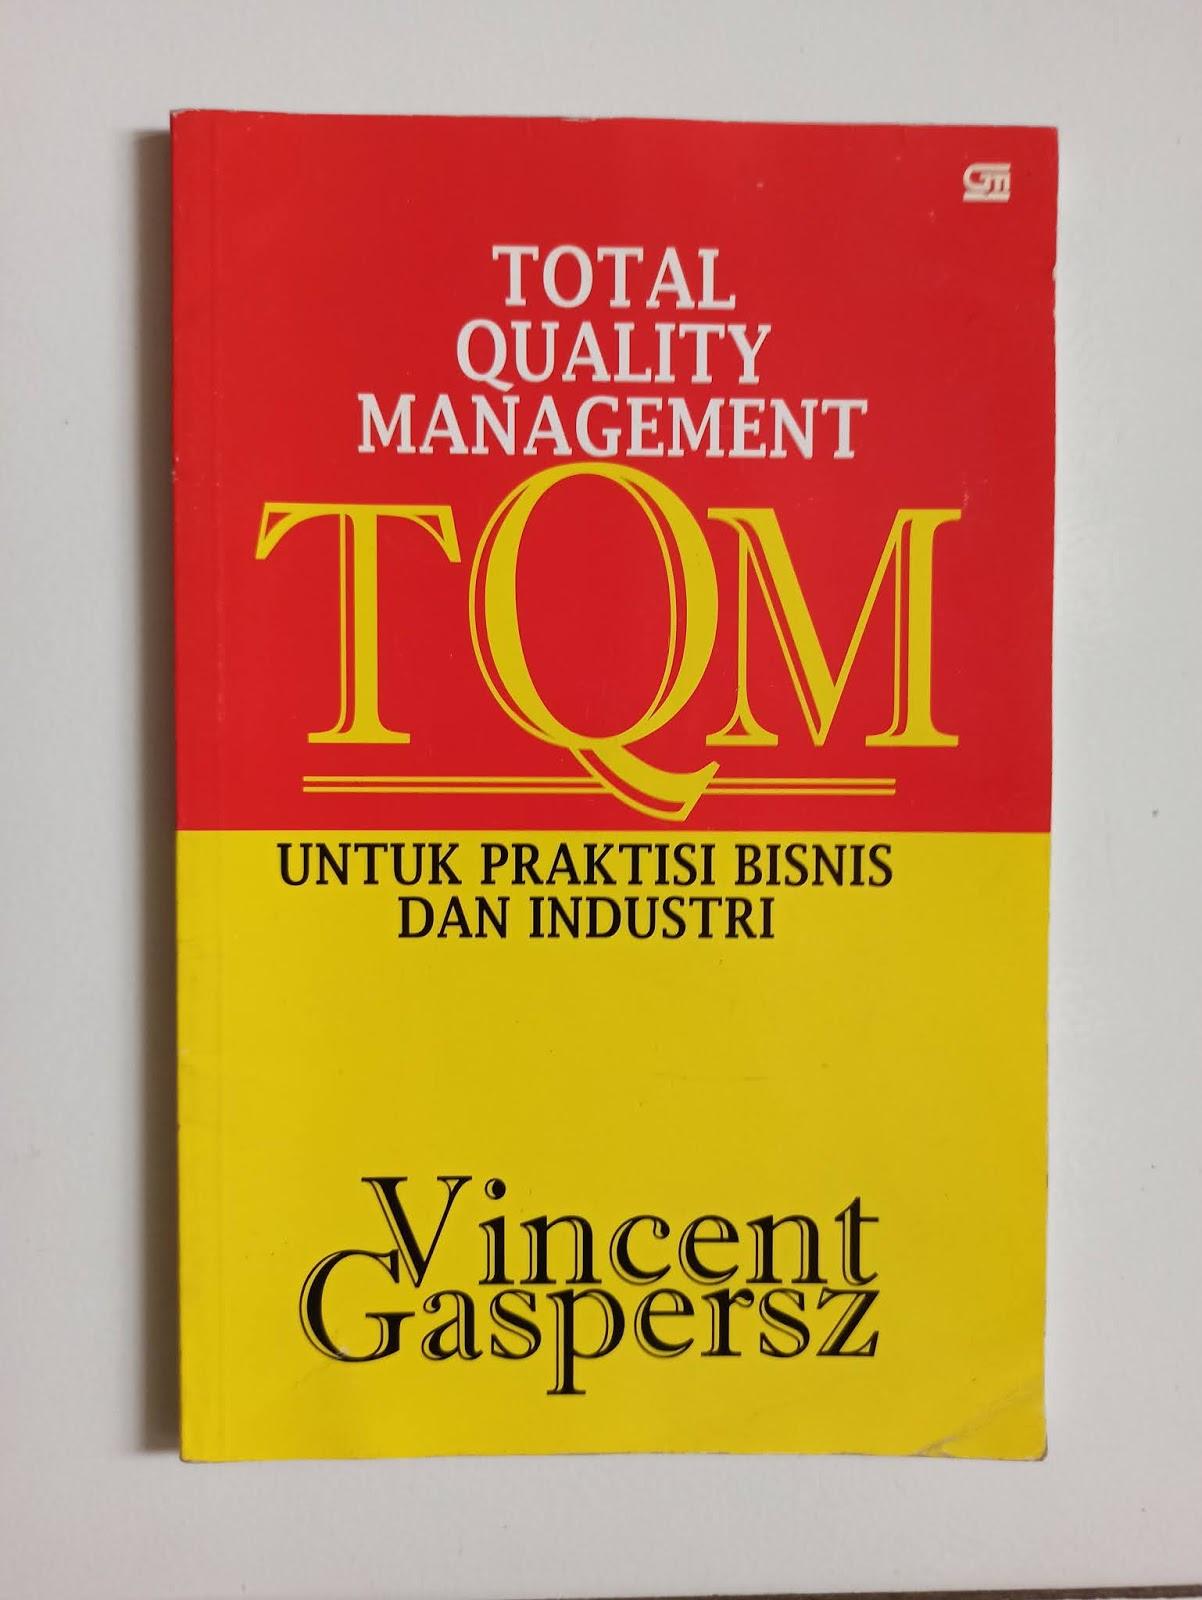 Buku karya Vincent Gaspersz